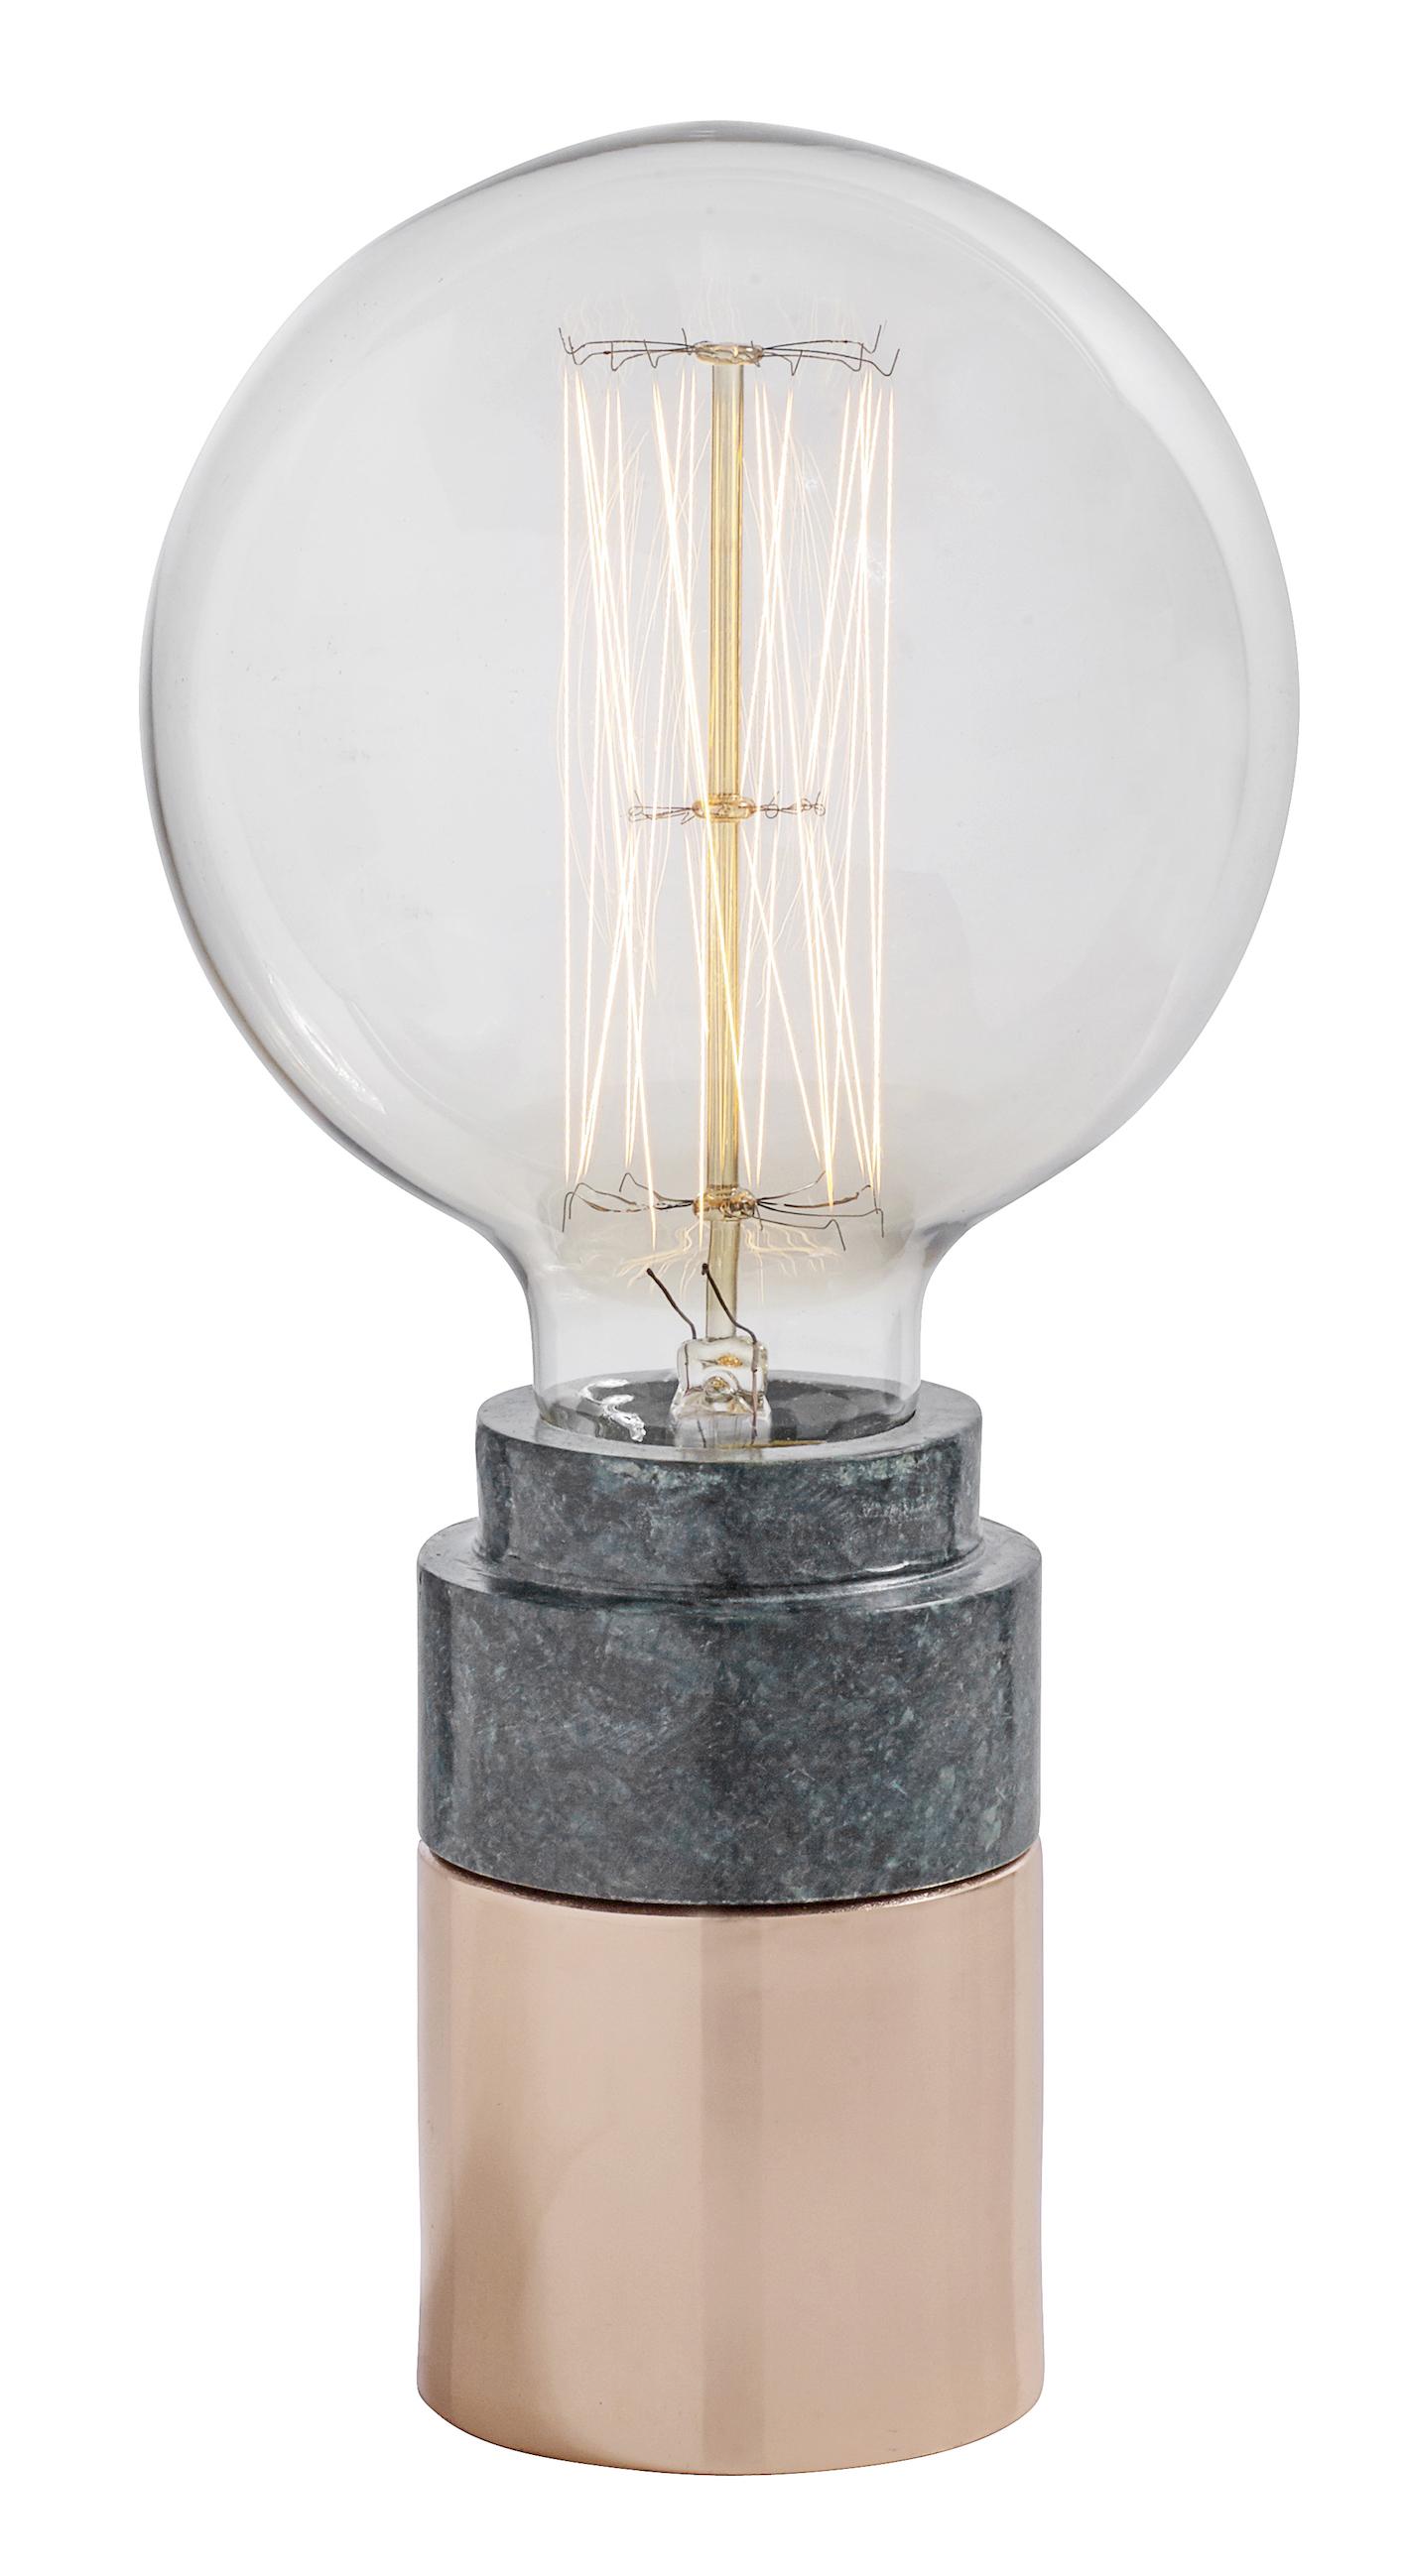 Marble bordslampa - koppar